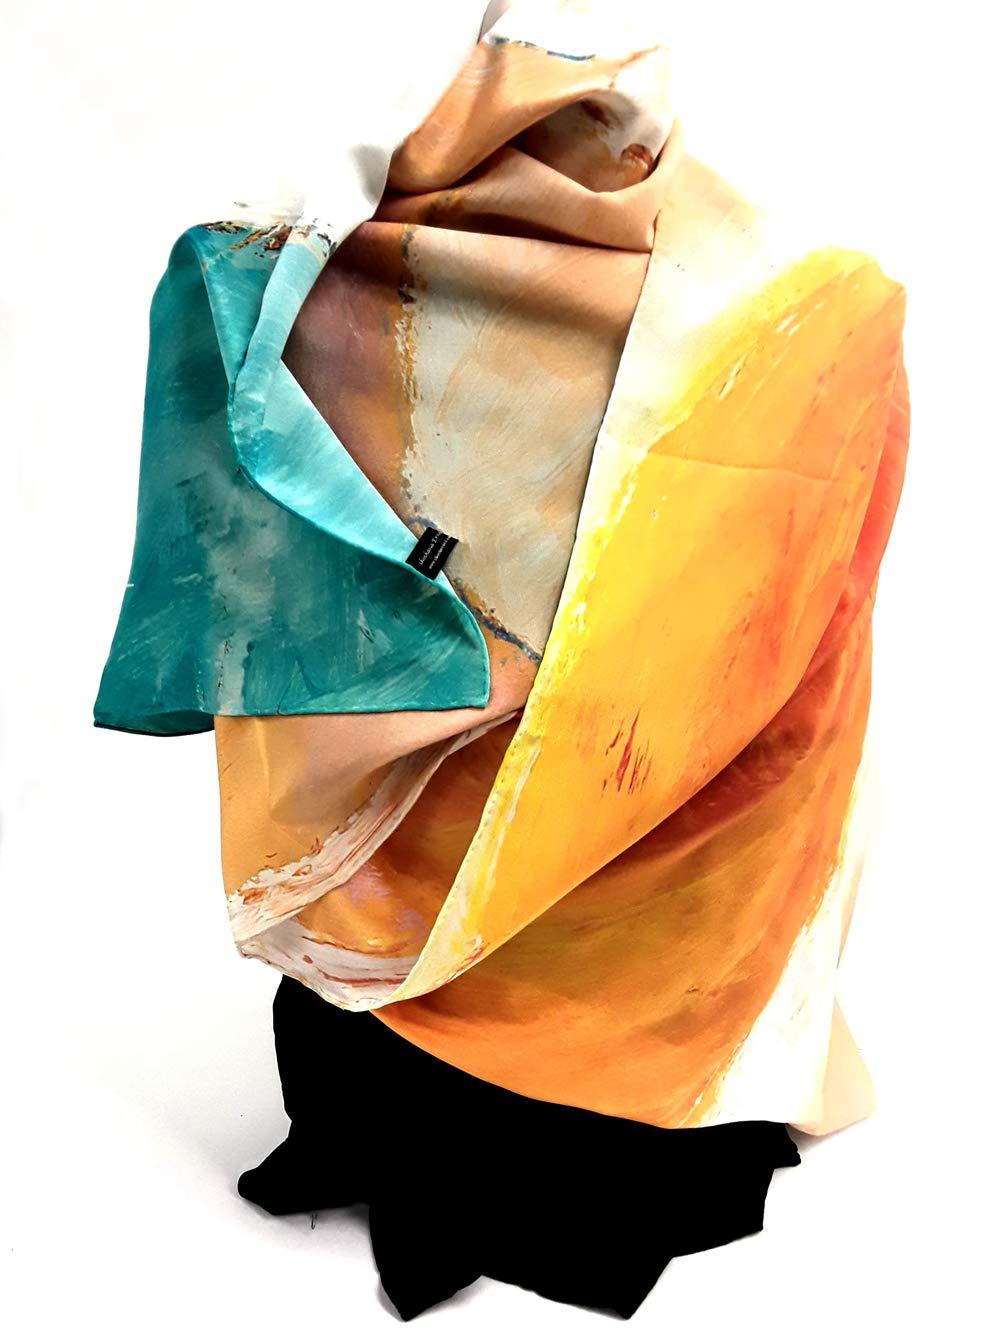 Designer silk scarves - Highest Quality 100% Silk scarf - Headscarf - Designer elegant headwrap - Silk infinity scarf - Crepe de Chine silk -''Sunny'' By Shoshana Ernst, artist and designer